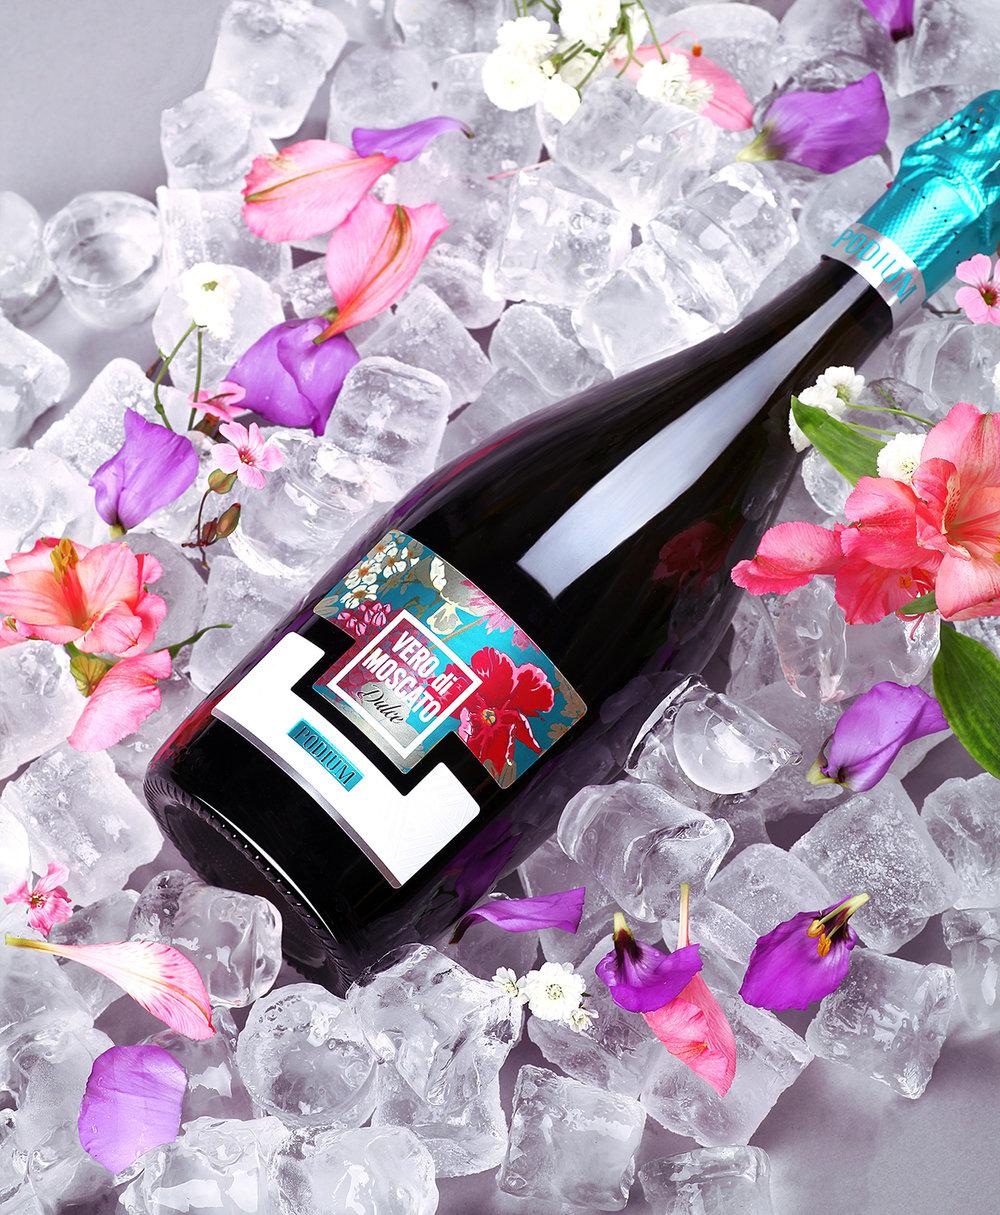 Champagne-design-Vero-di-Moscatodizajn-shampanskogo-5.jpg